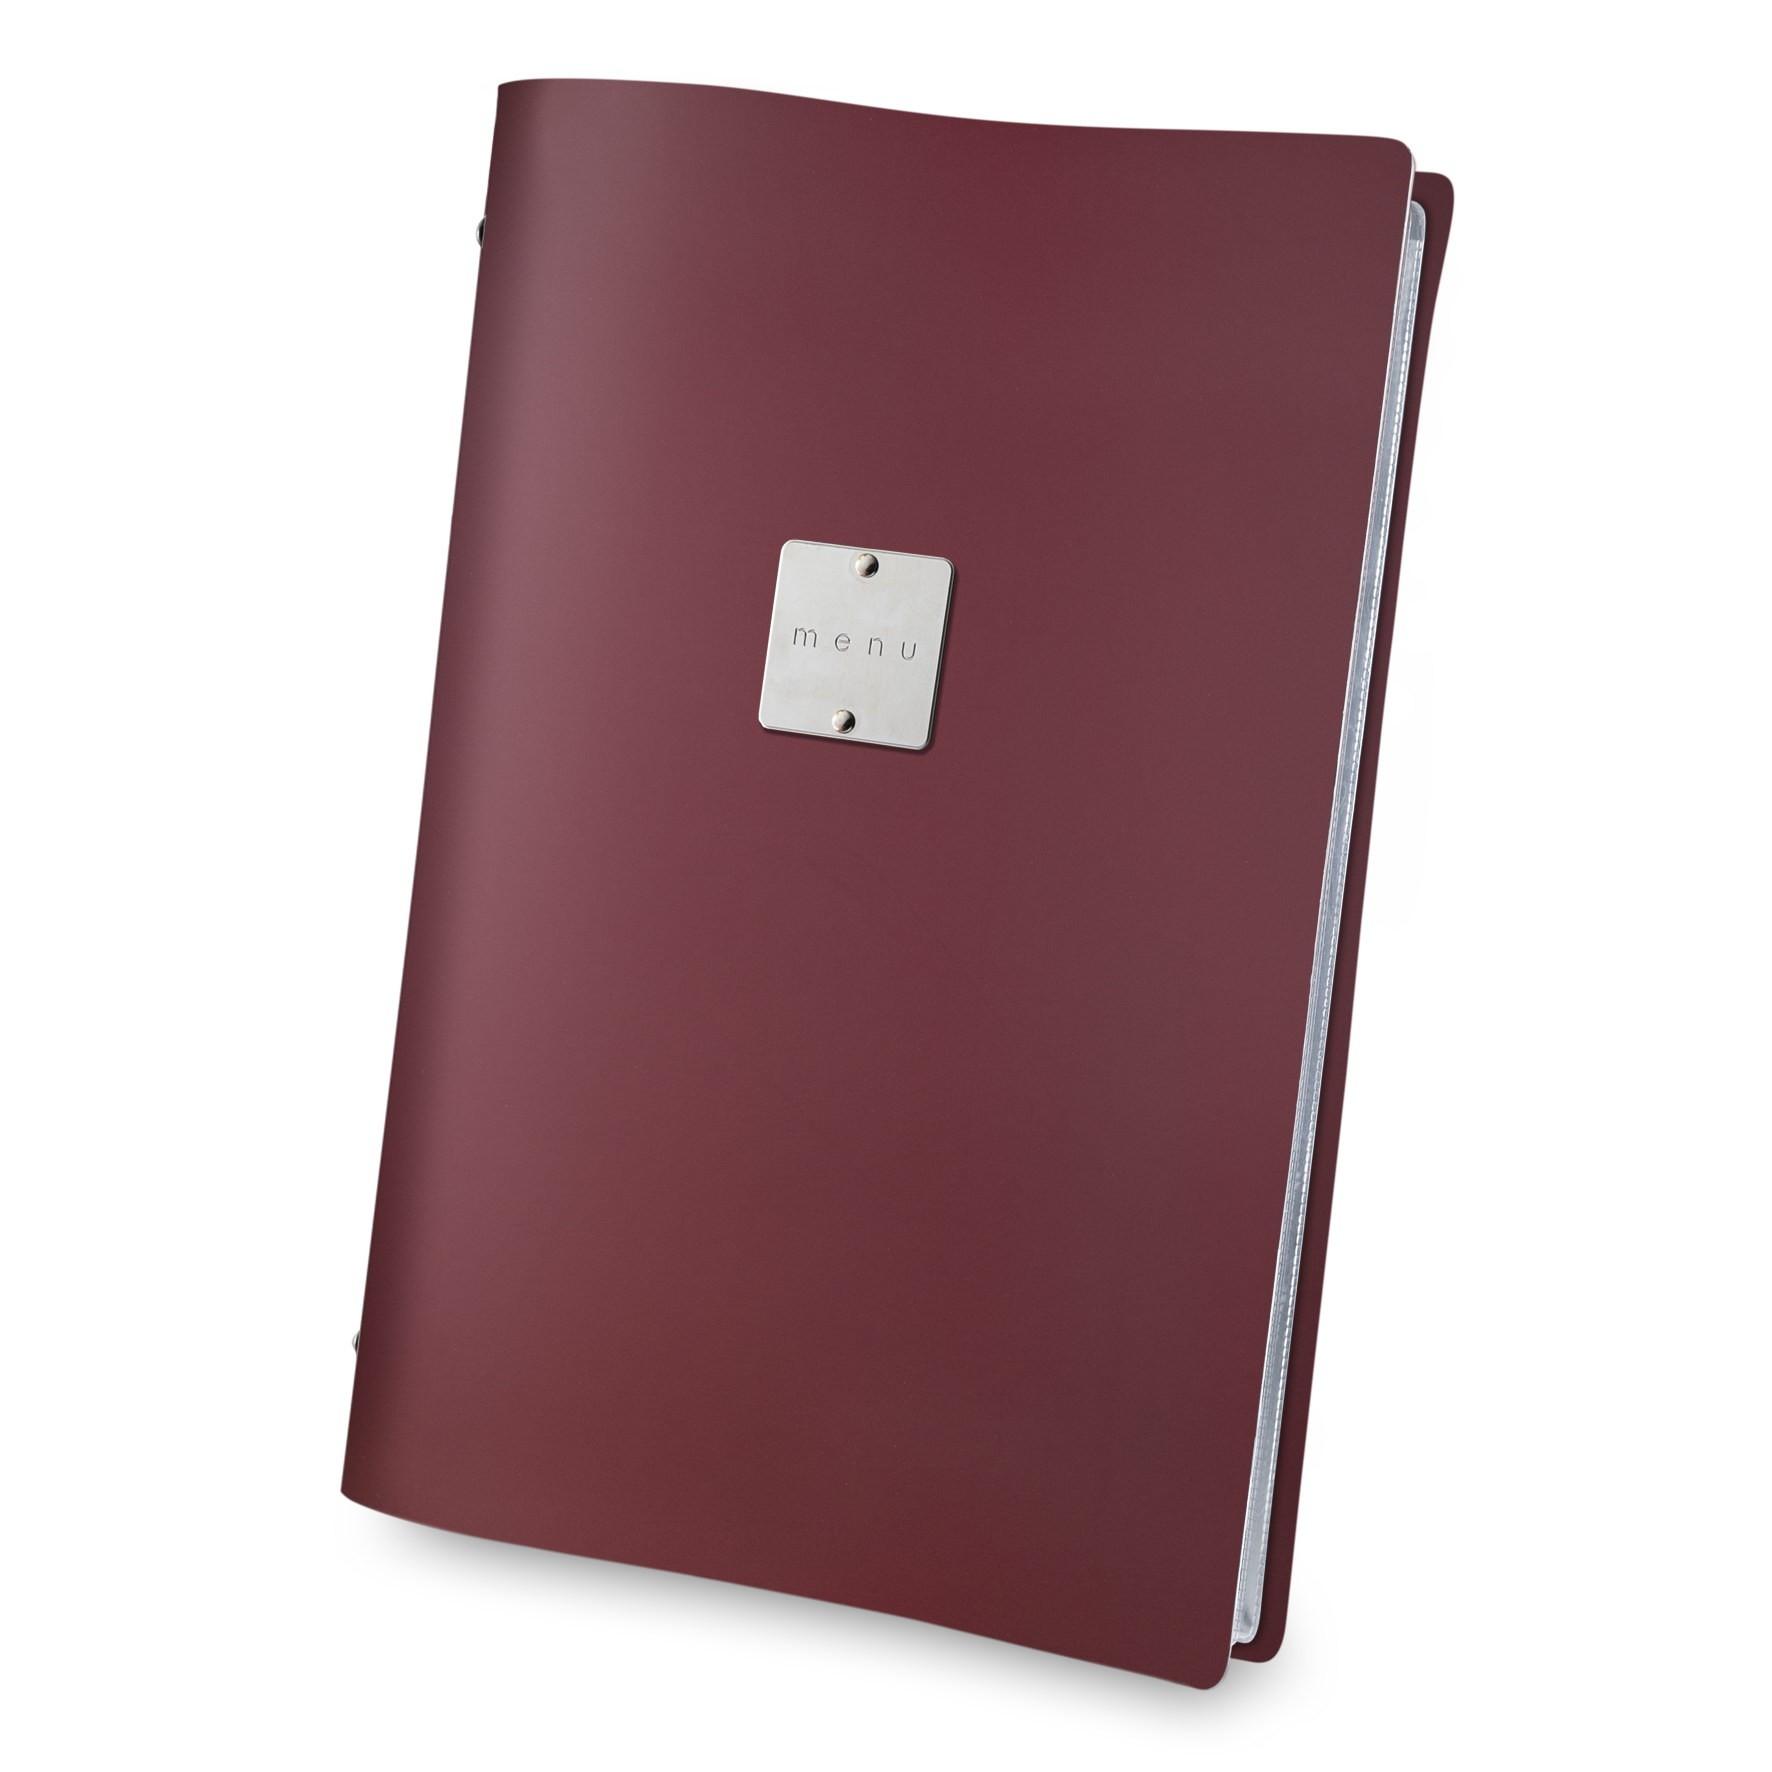 Fashion menu cover burgundy